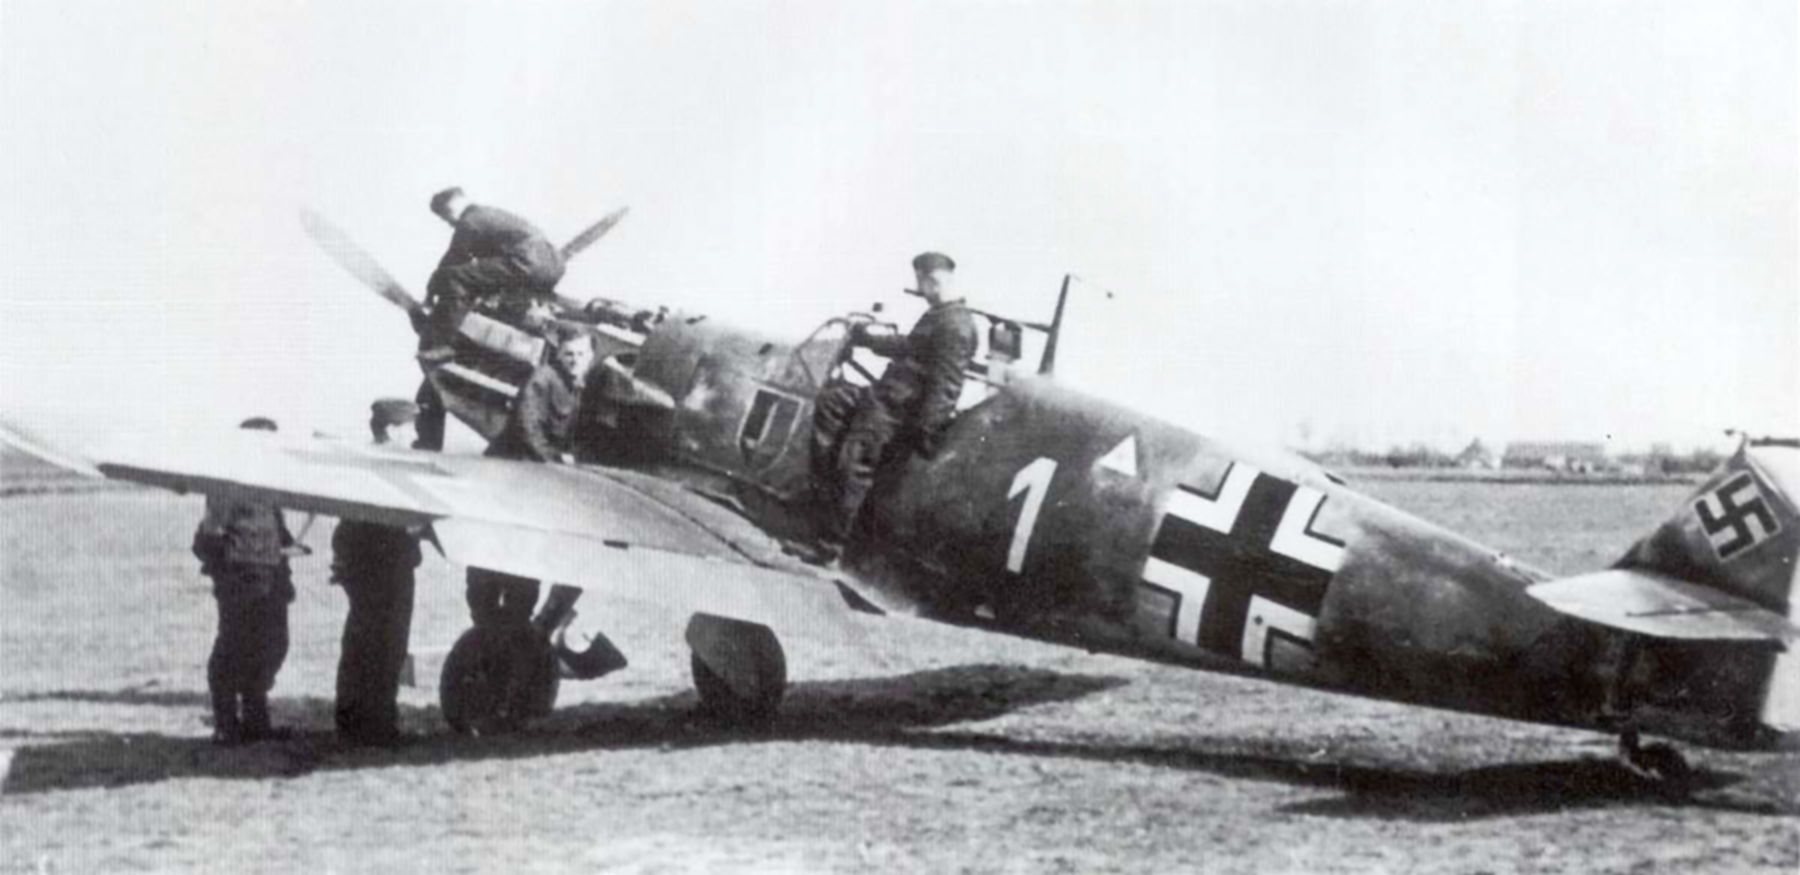 Messerschmitt Bf 109E4 1.JG52 White 1 Johannes Steinhoff Germany 1941 02